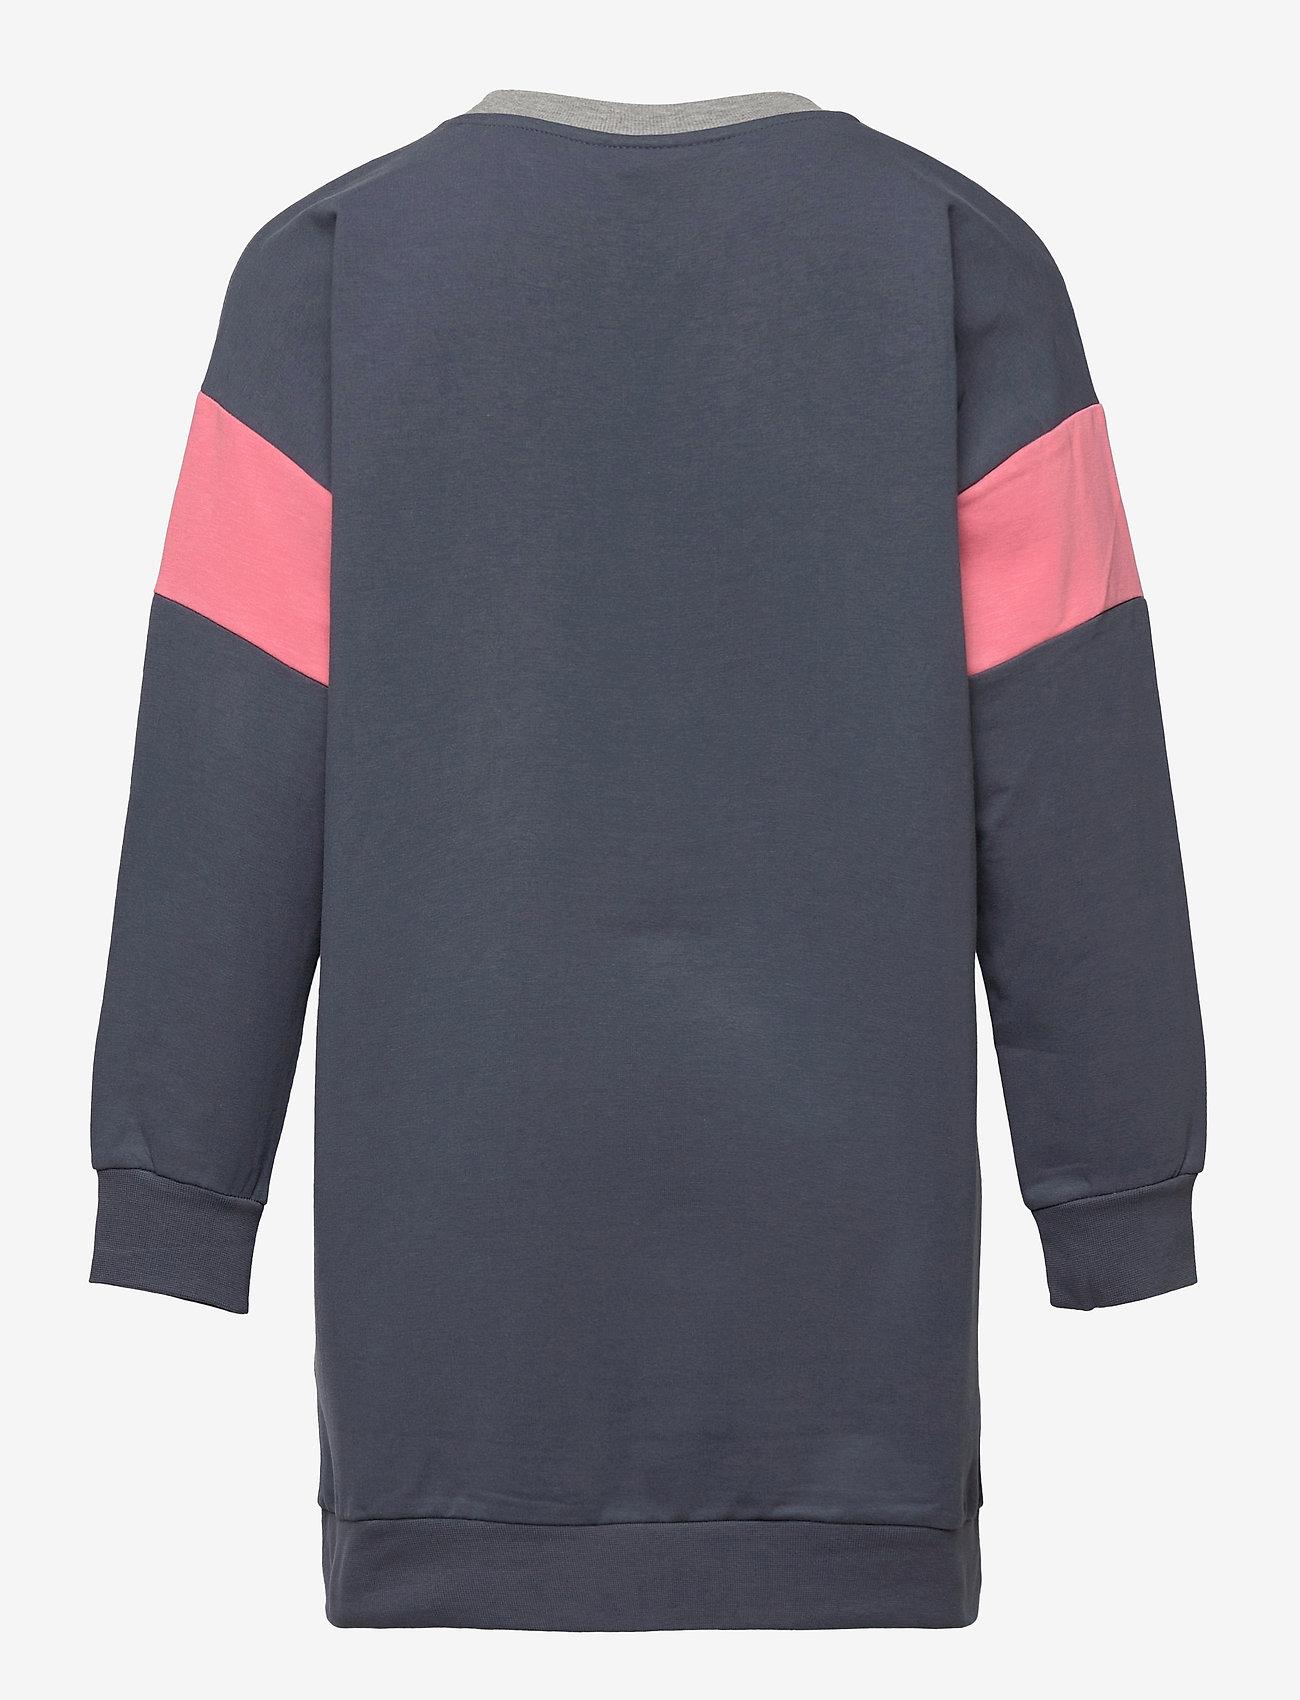 Hummel - hmlTILLY DRESS L/S - kleider - ombre blue - 1